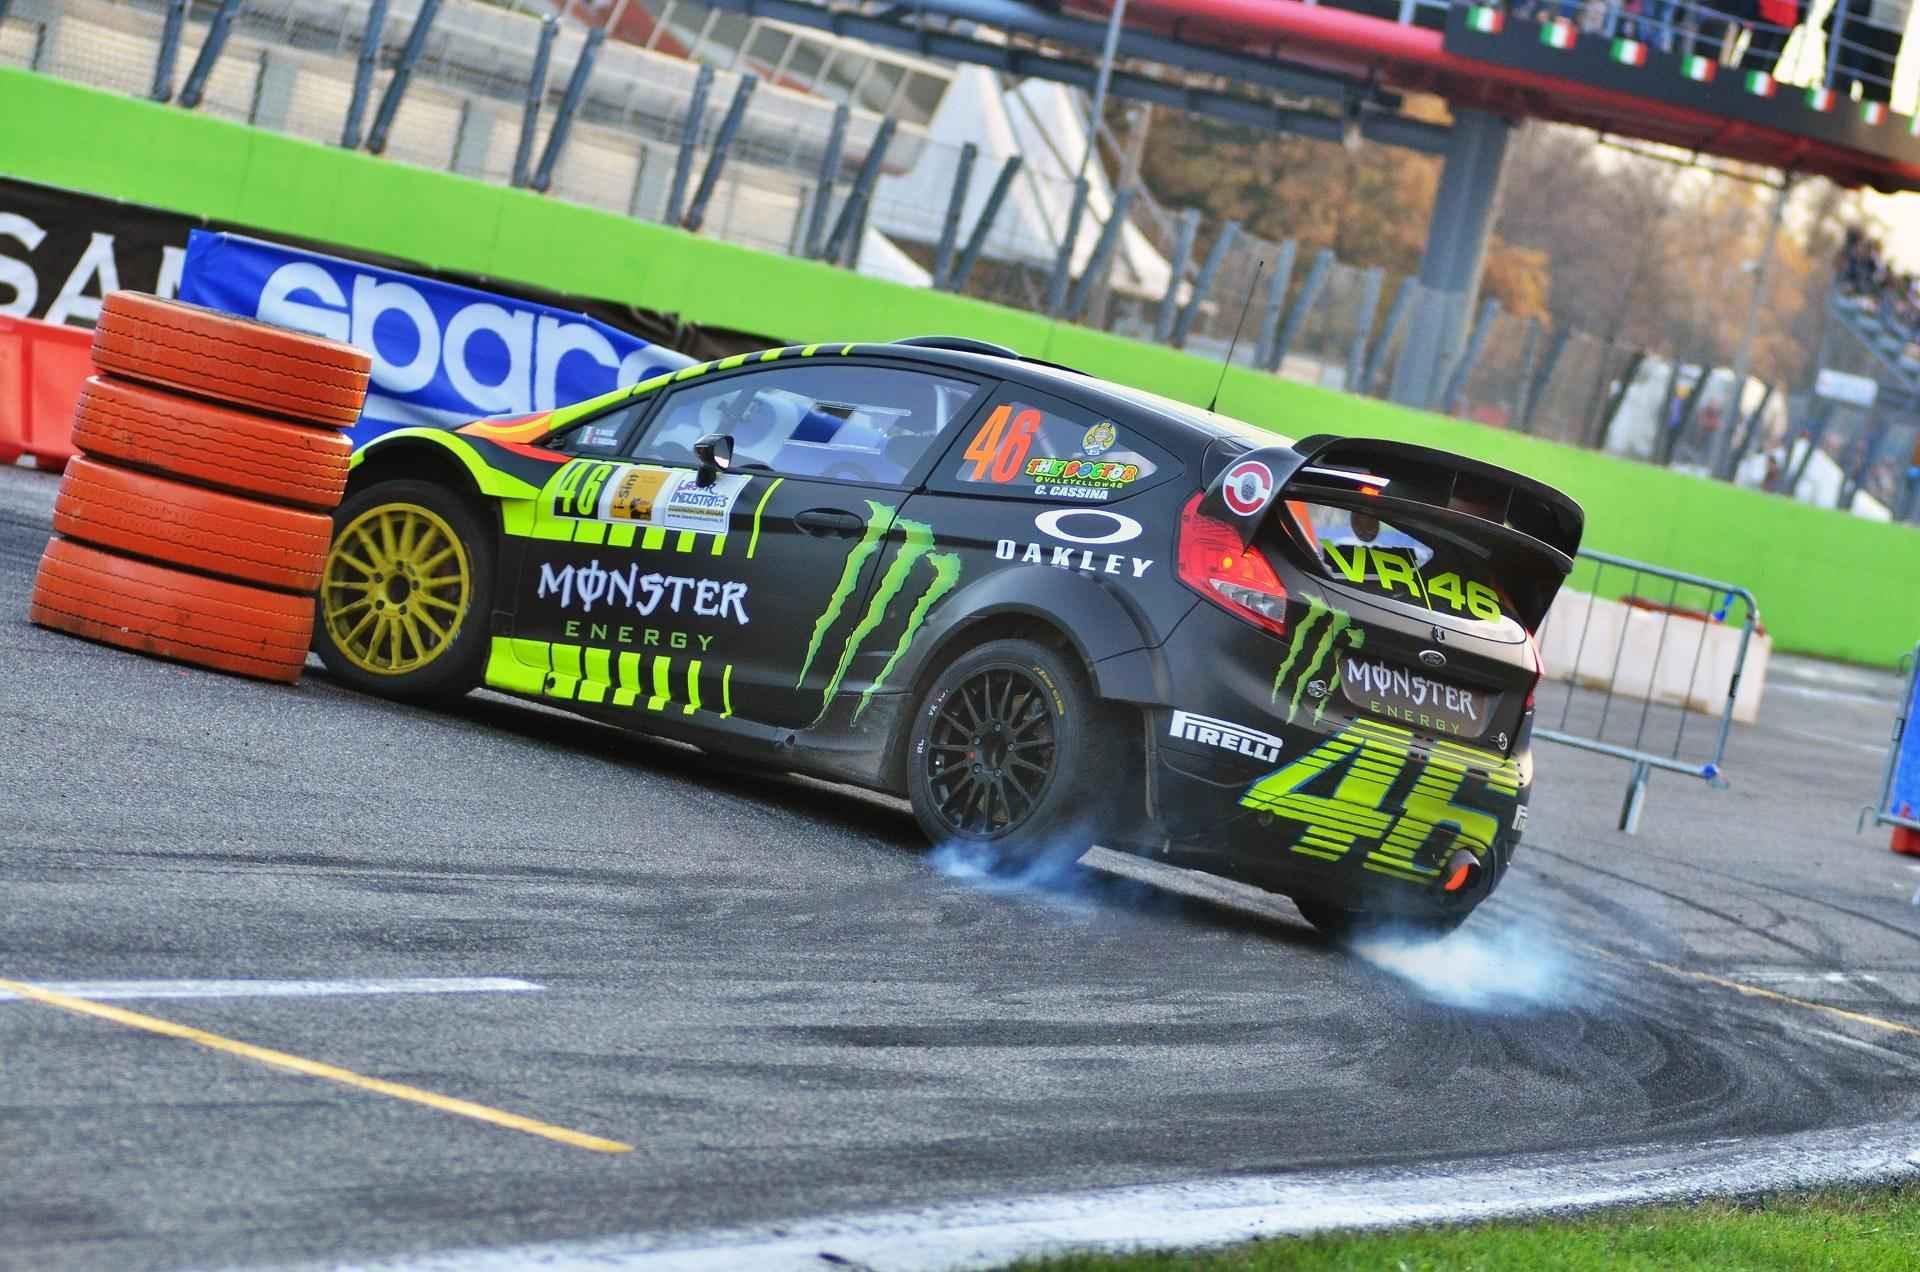 Valentino Rossi amazing overtake & near crash at Monza ...